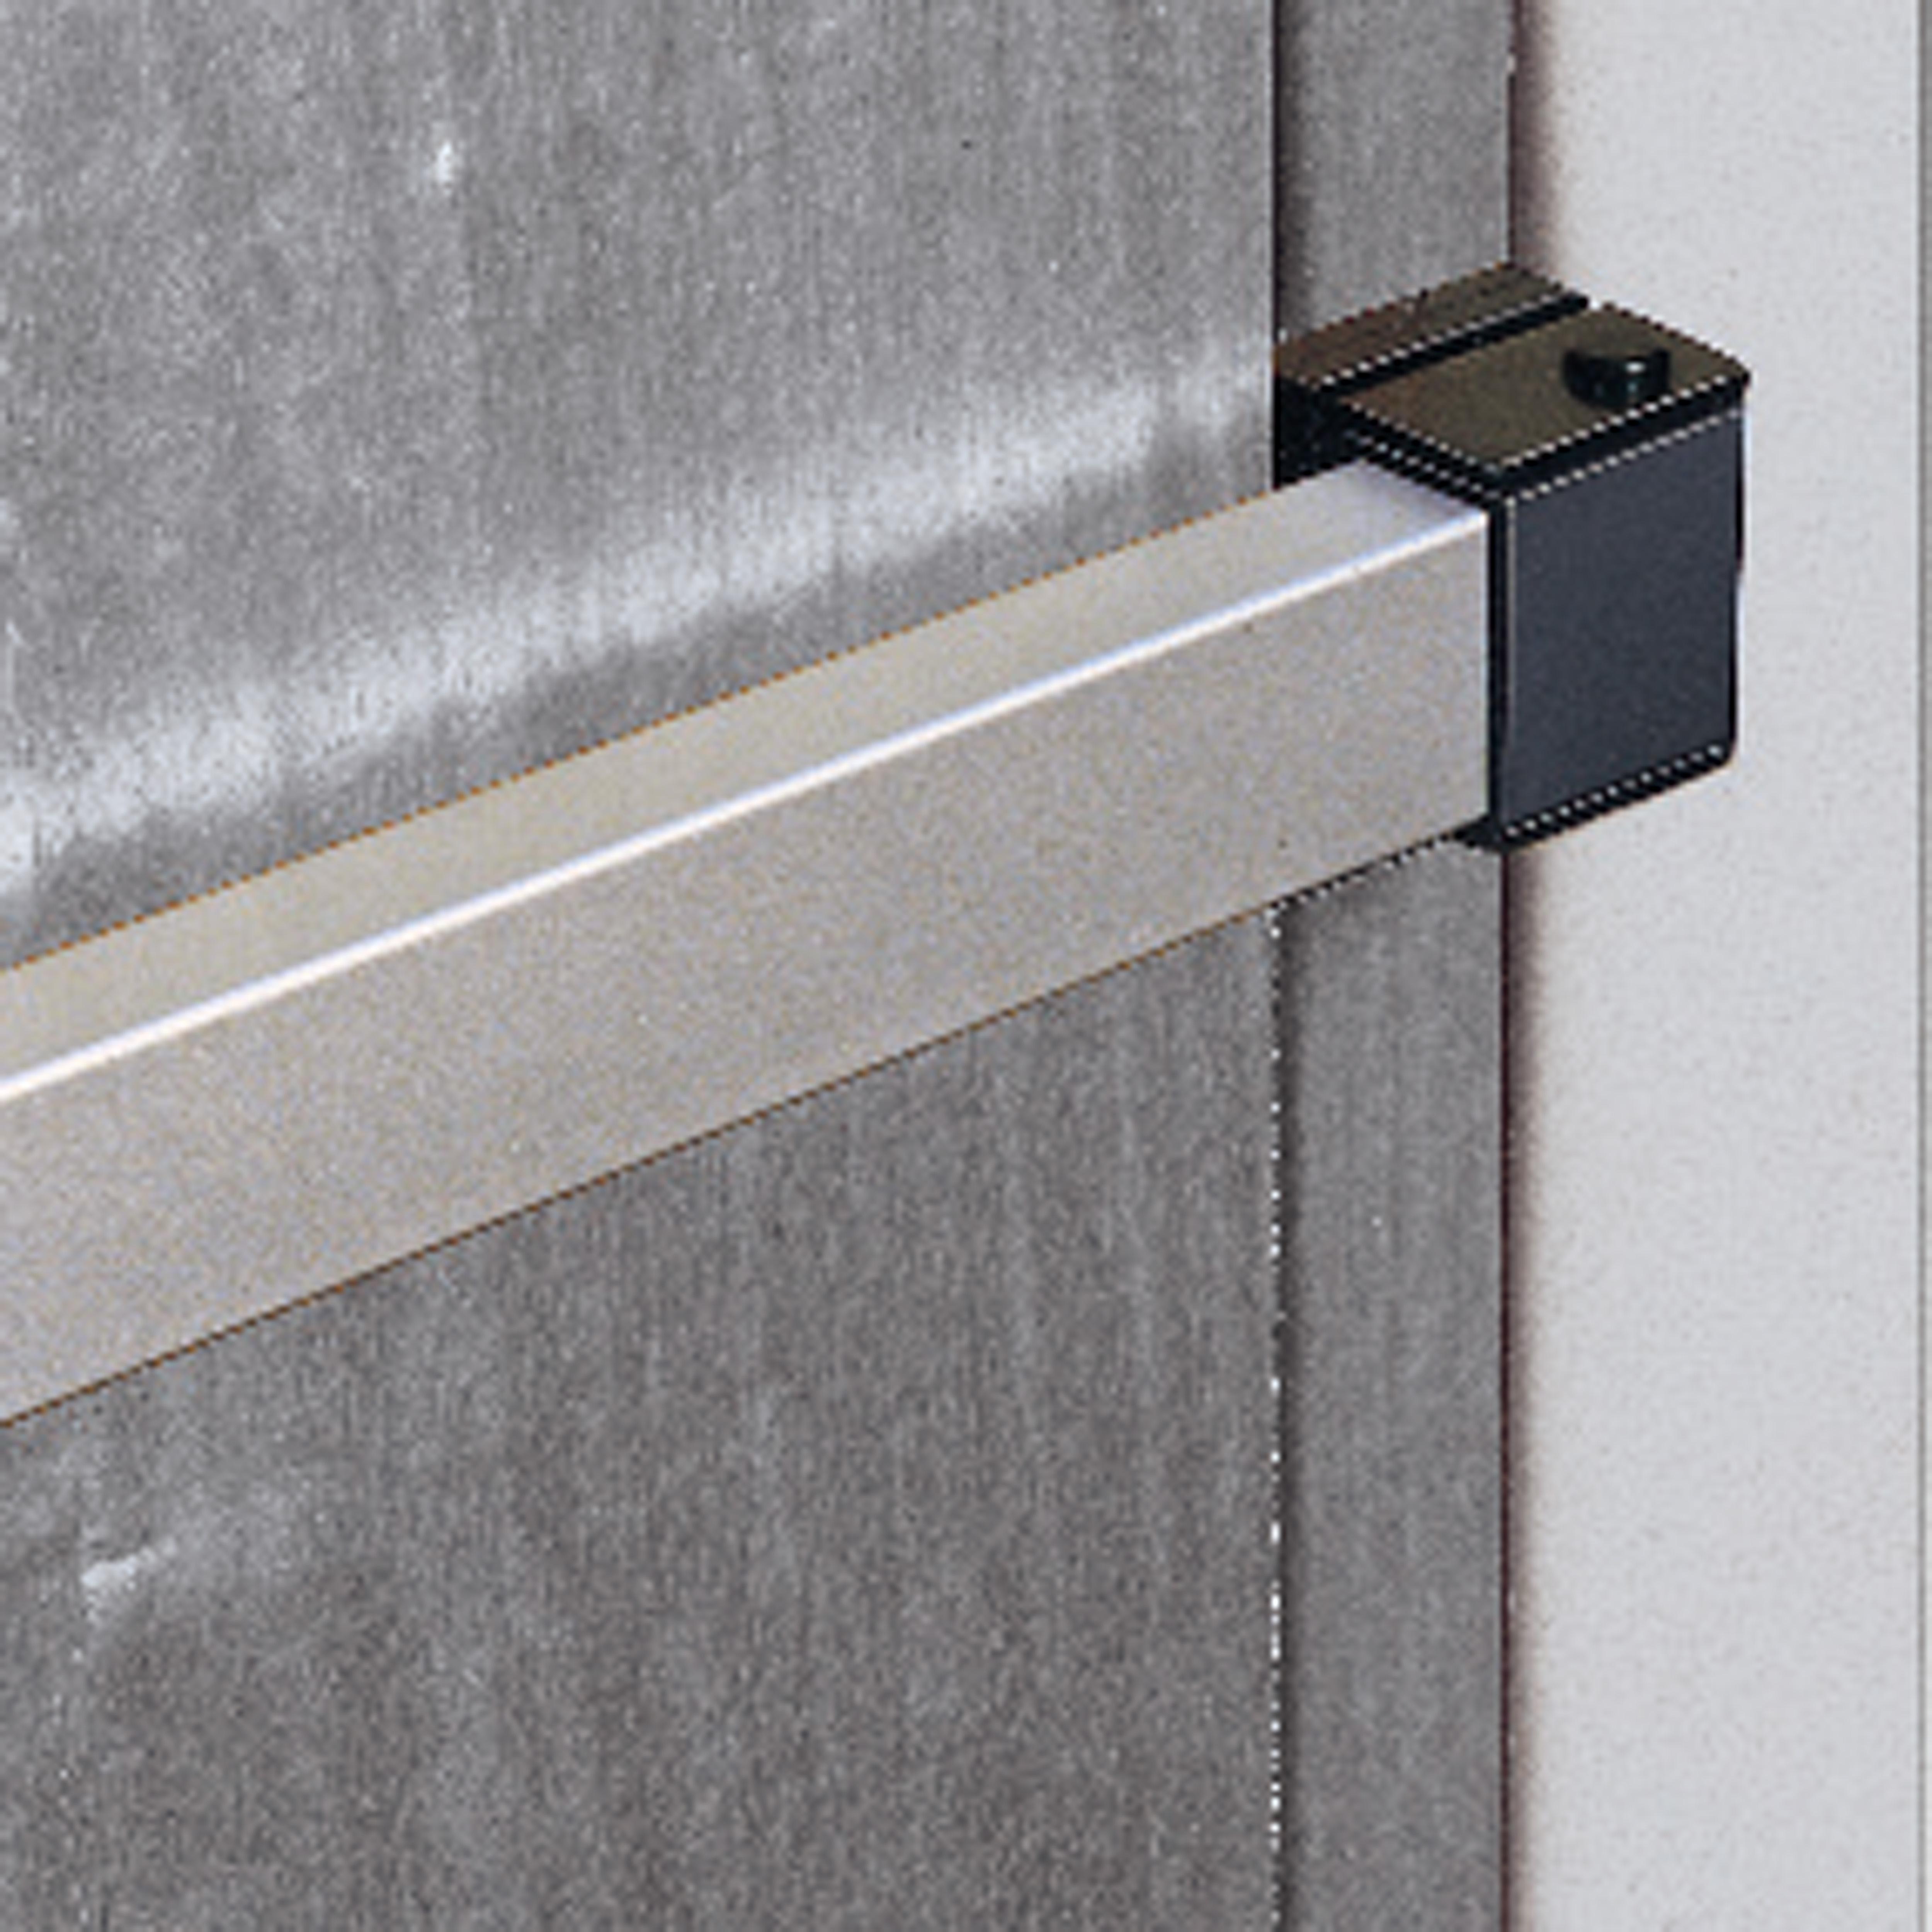 abus panzer riegelschlo pr 1500 780 1040 mm. Black Bedroom Furniture Sets. Home Design Ideas